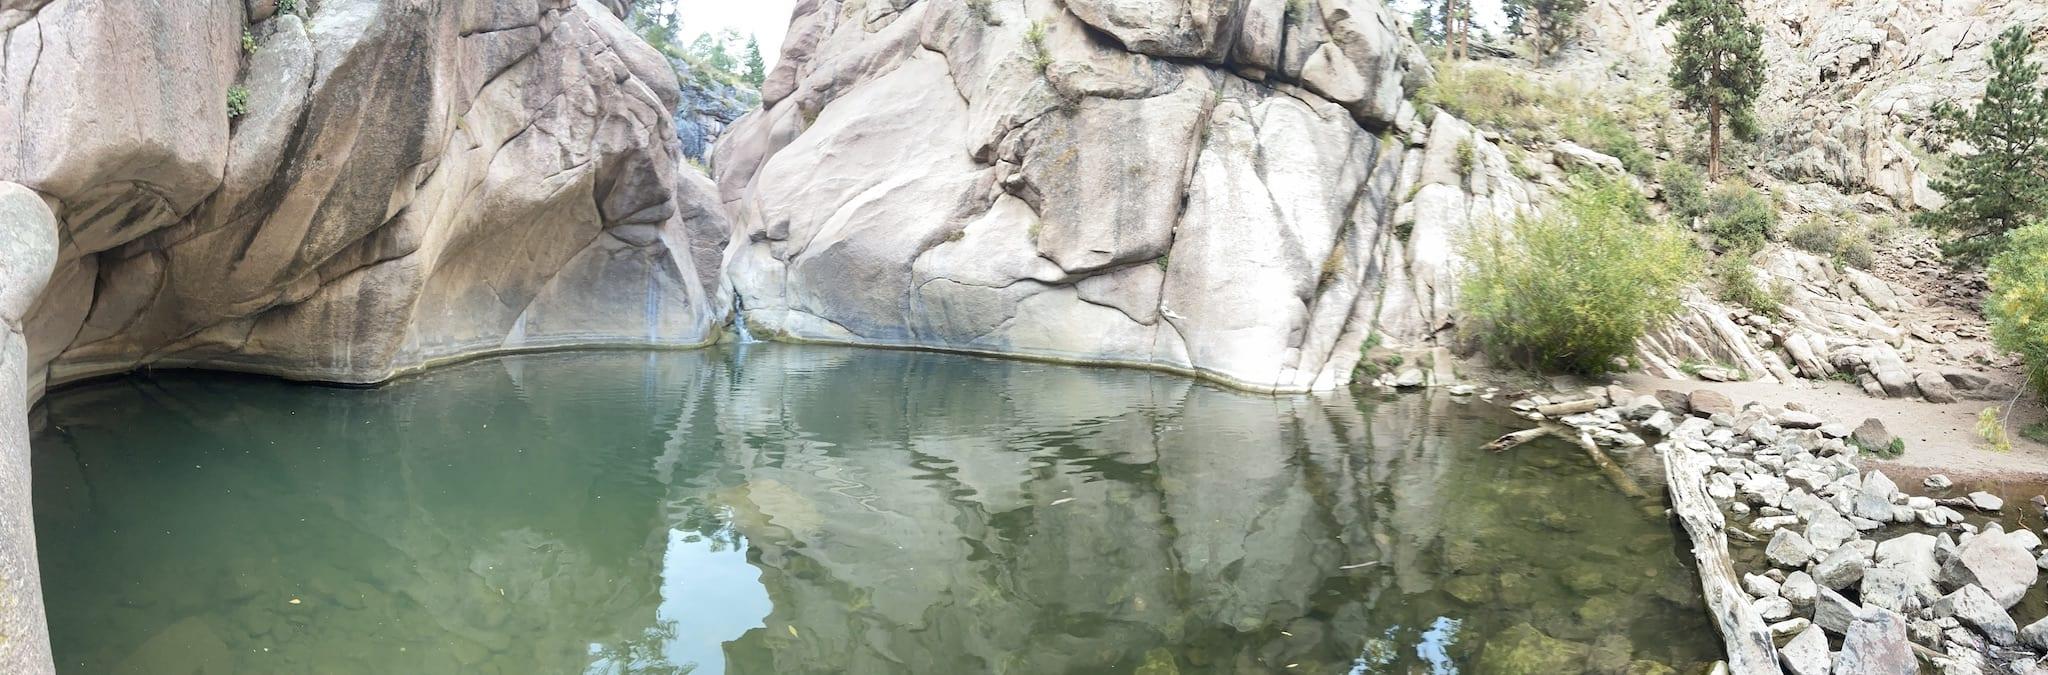 Paradise Cove Guffey Gorge